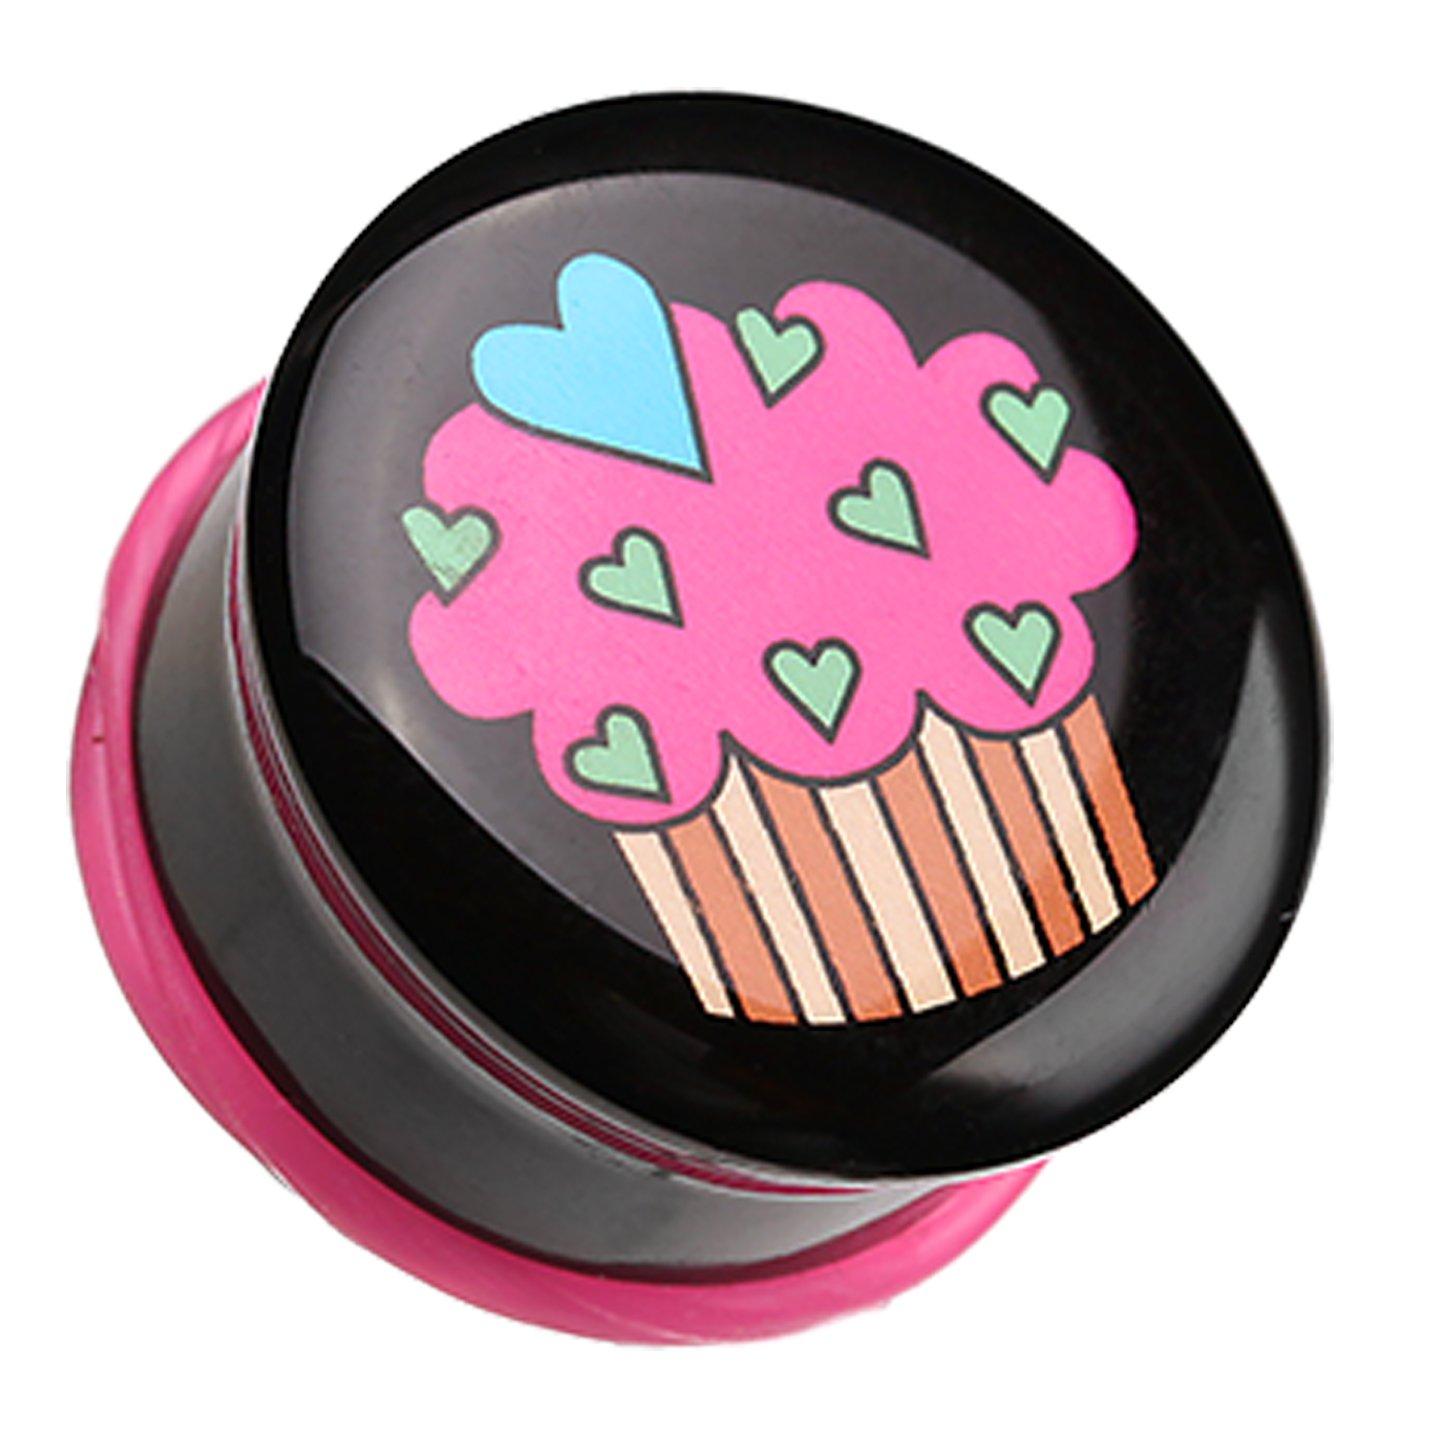 Heartful Cupcake Single Flared Ear Gauge Plug Sold as a Pair